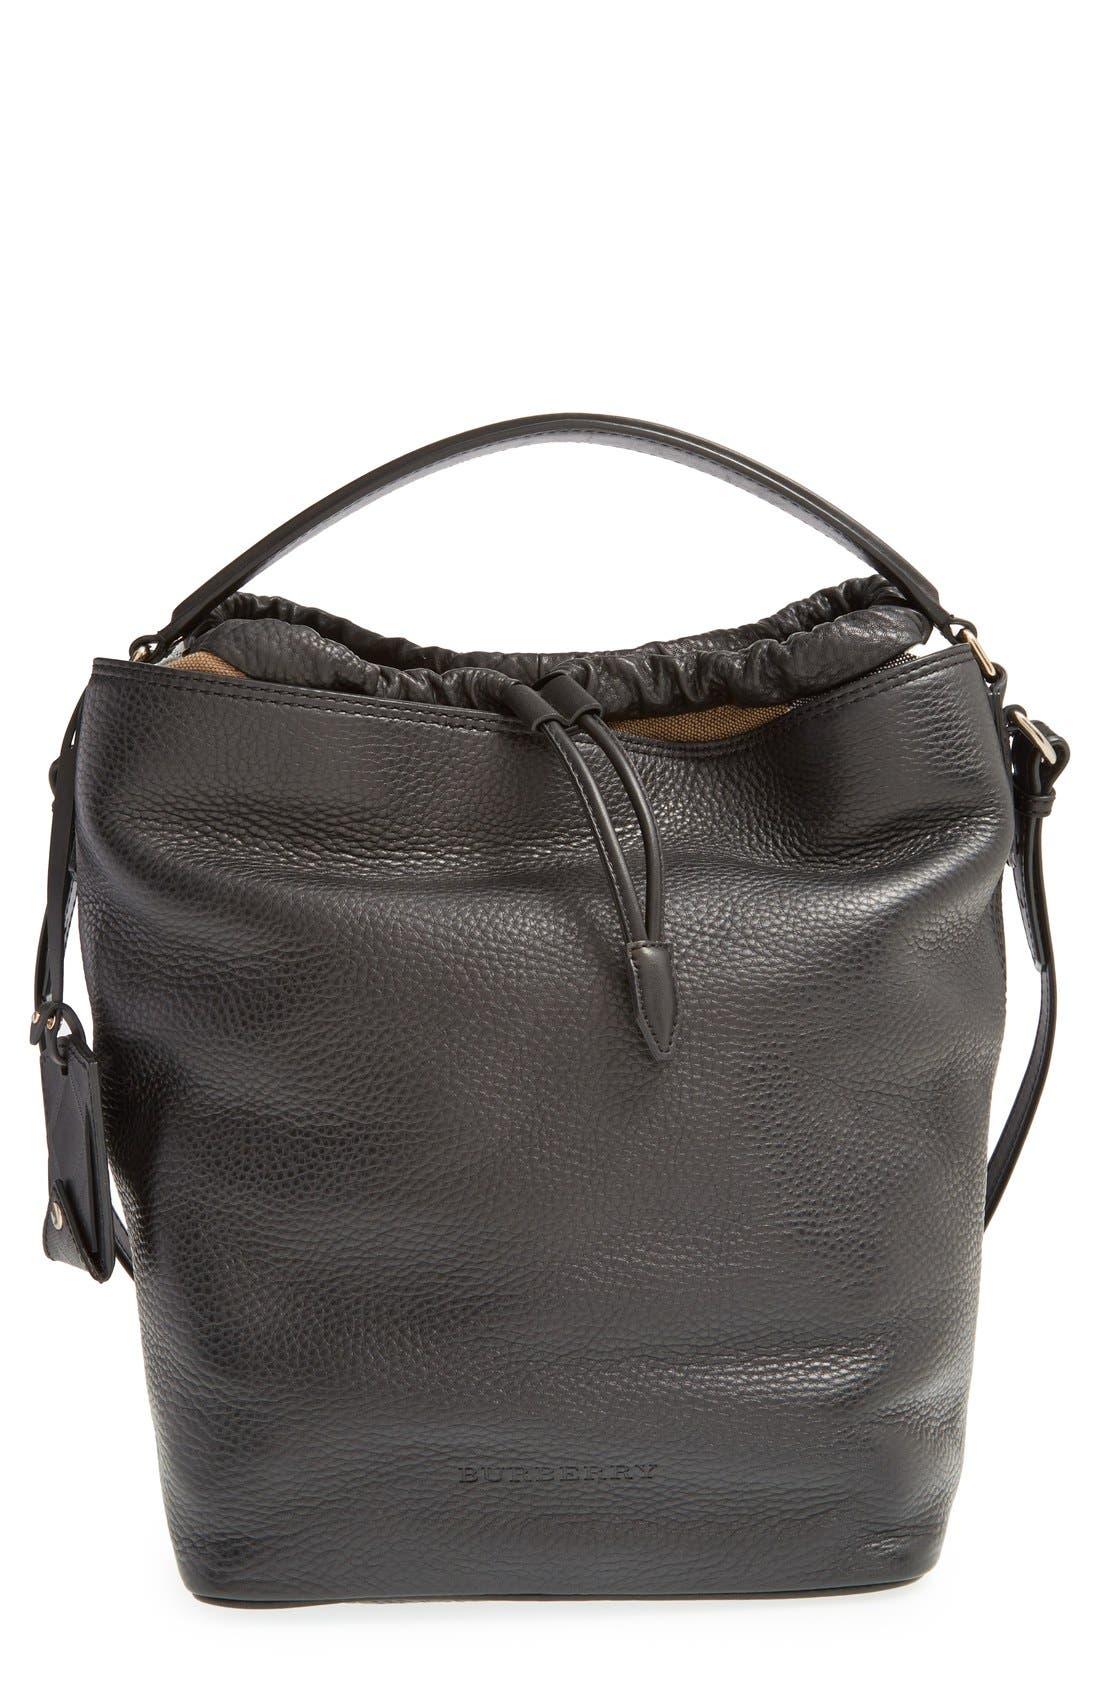 Brit 'Medium Susanna' Leather & Canvas Check Hobo Bag, Main, color, 001